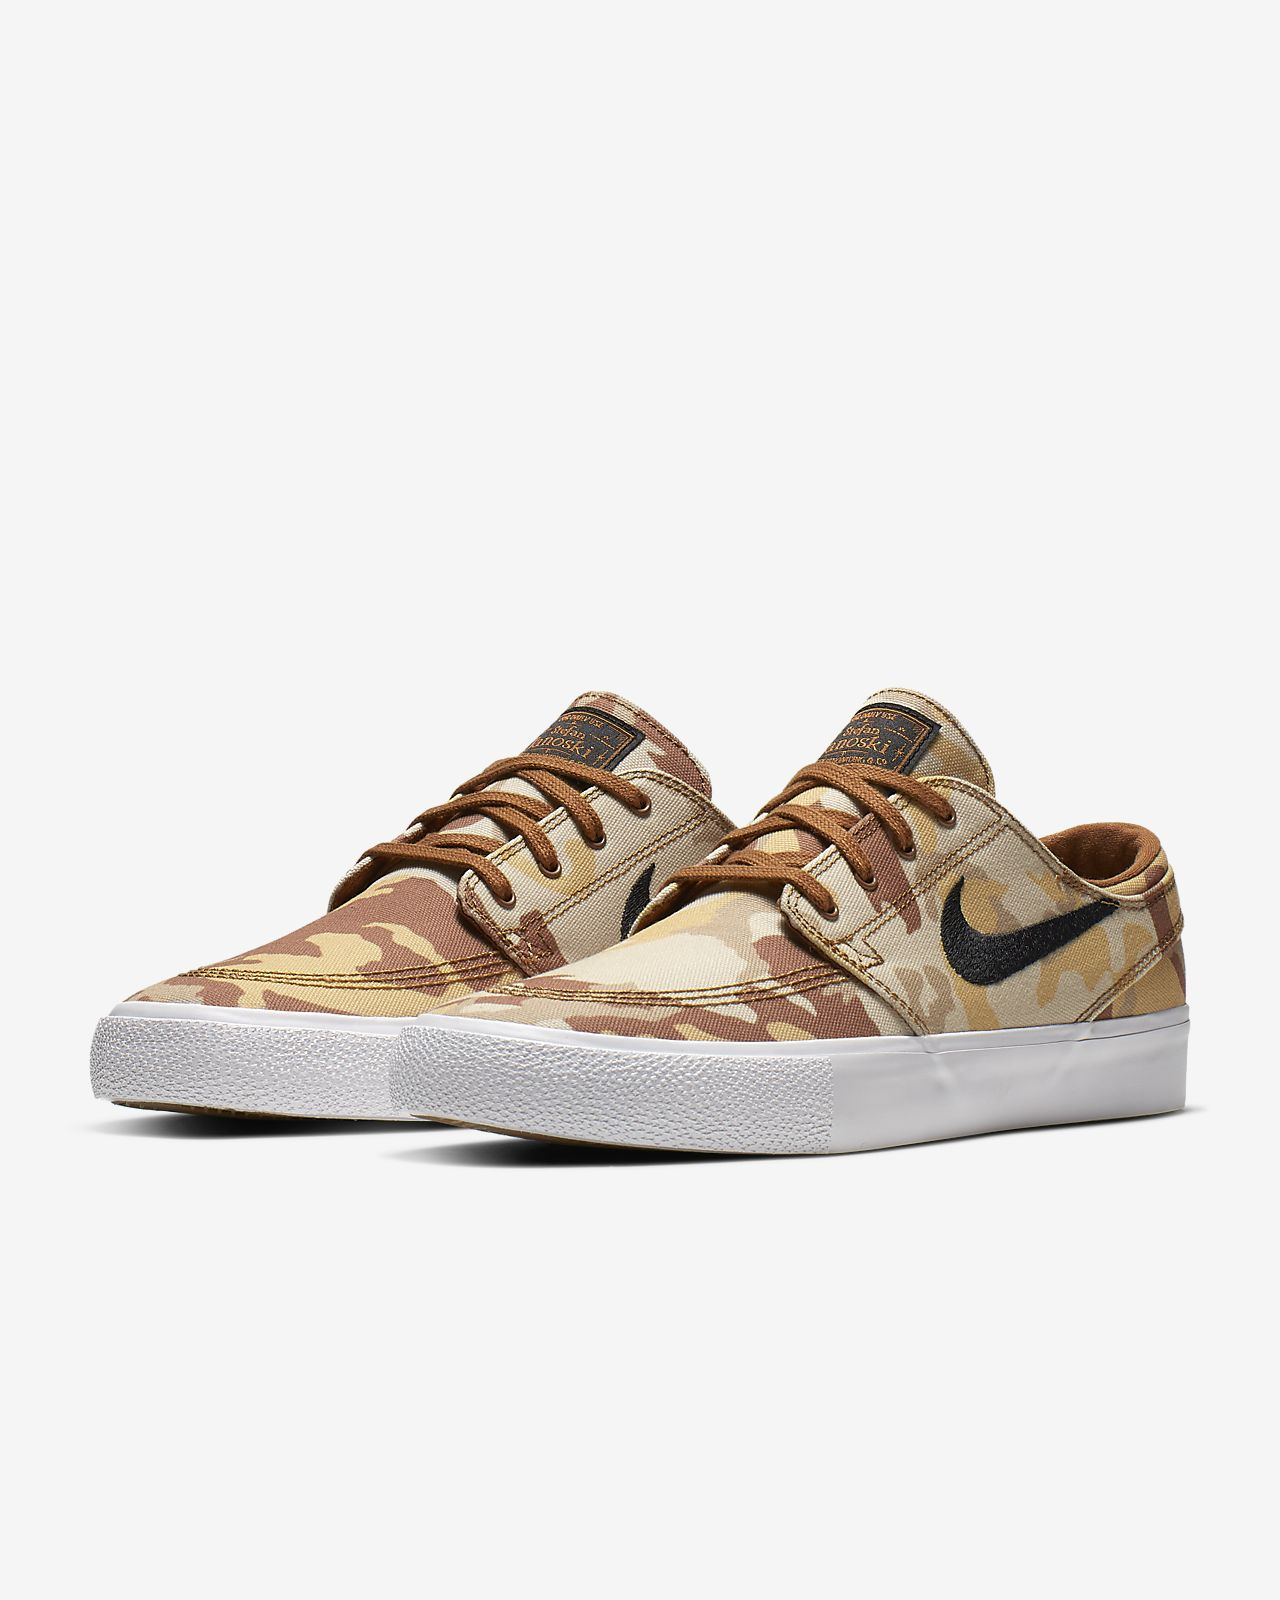 wholesale dealer 2015e 9bdb5 ... Nike SB Zoom Janoski Canvas Premium RM Skate Shoe